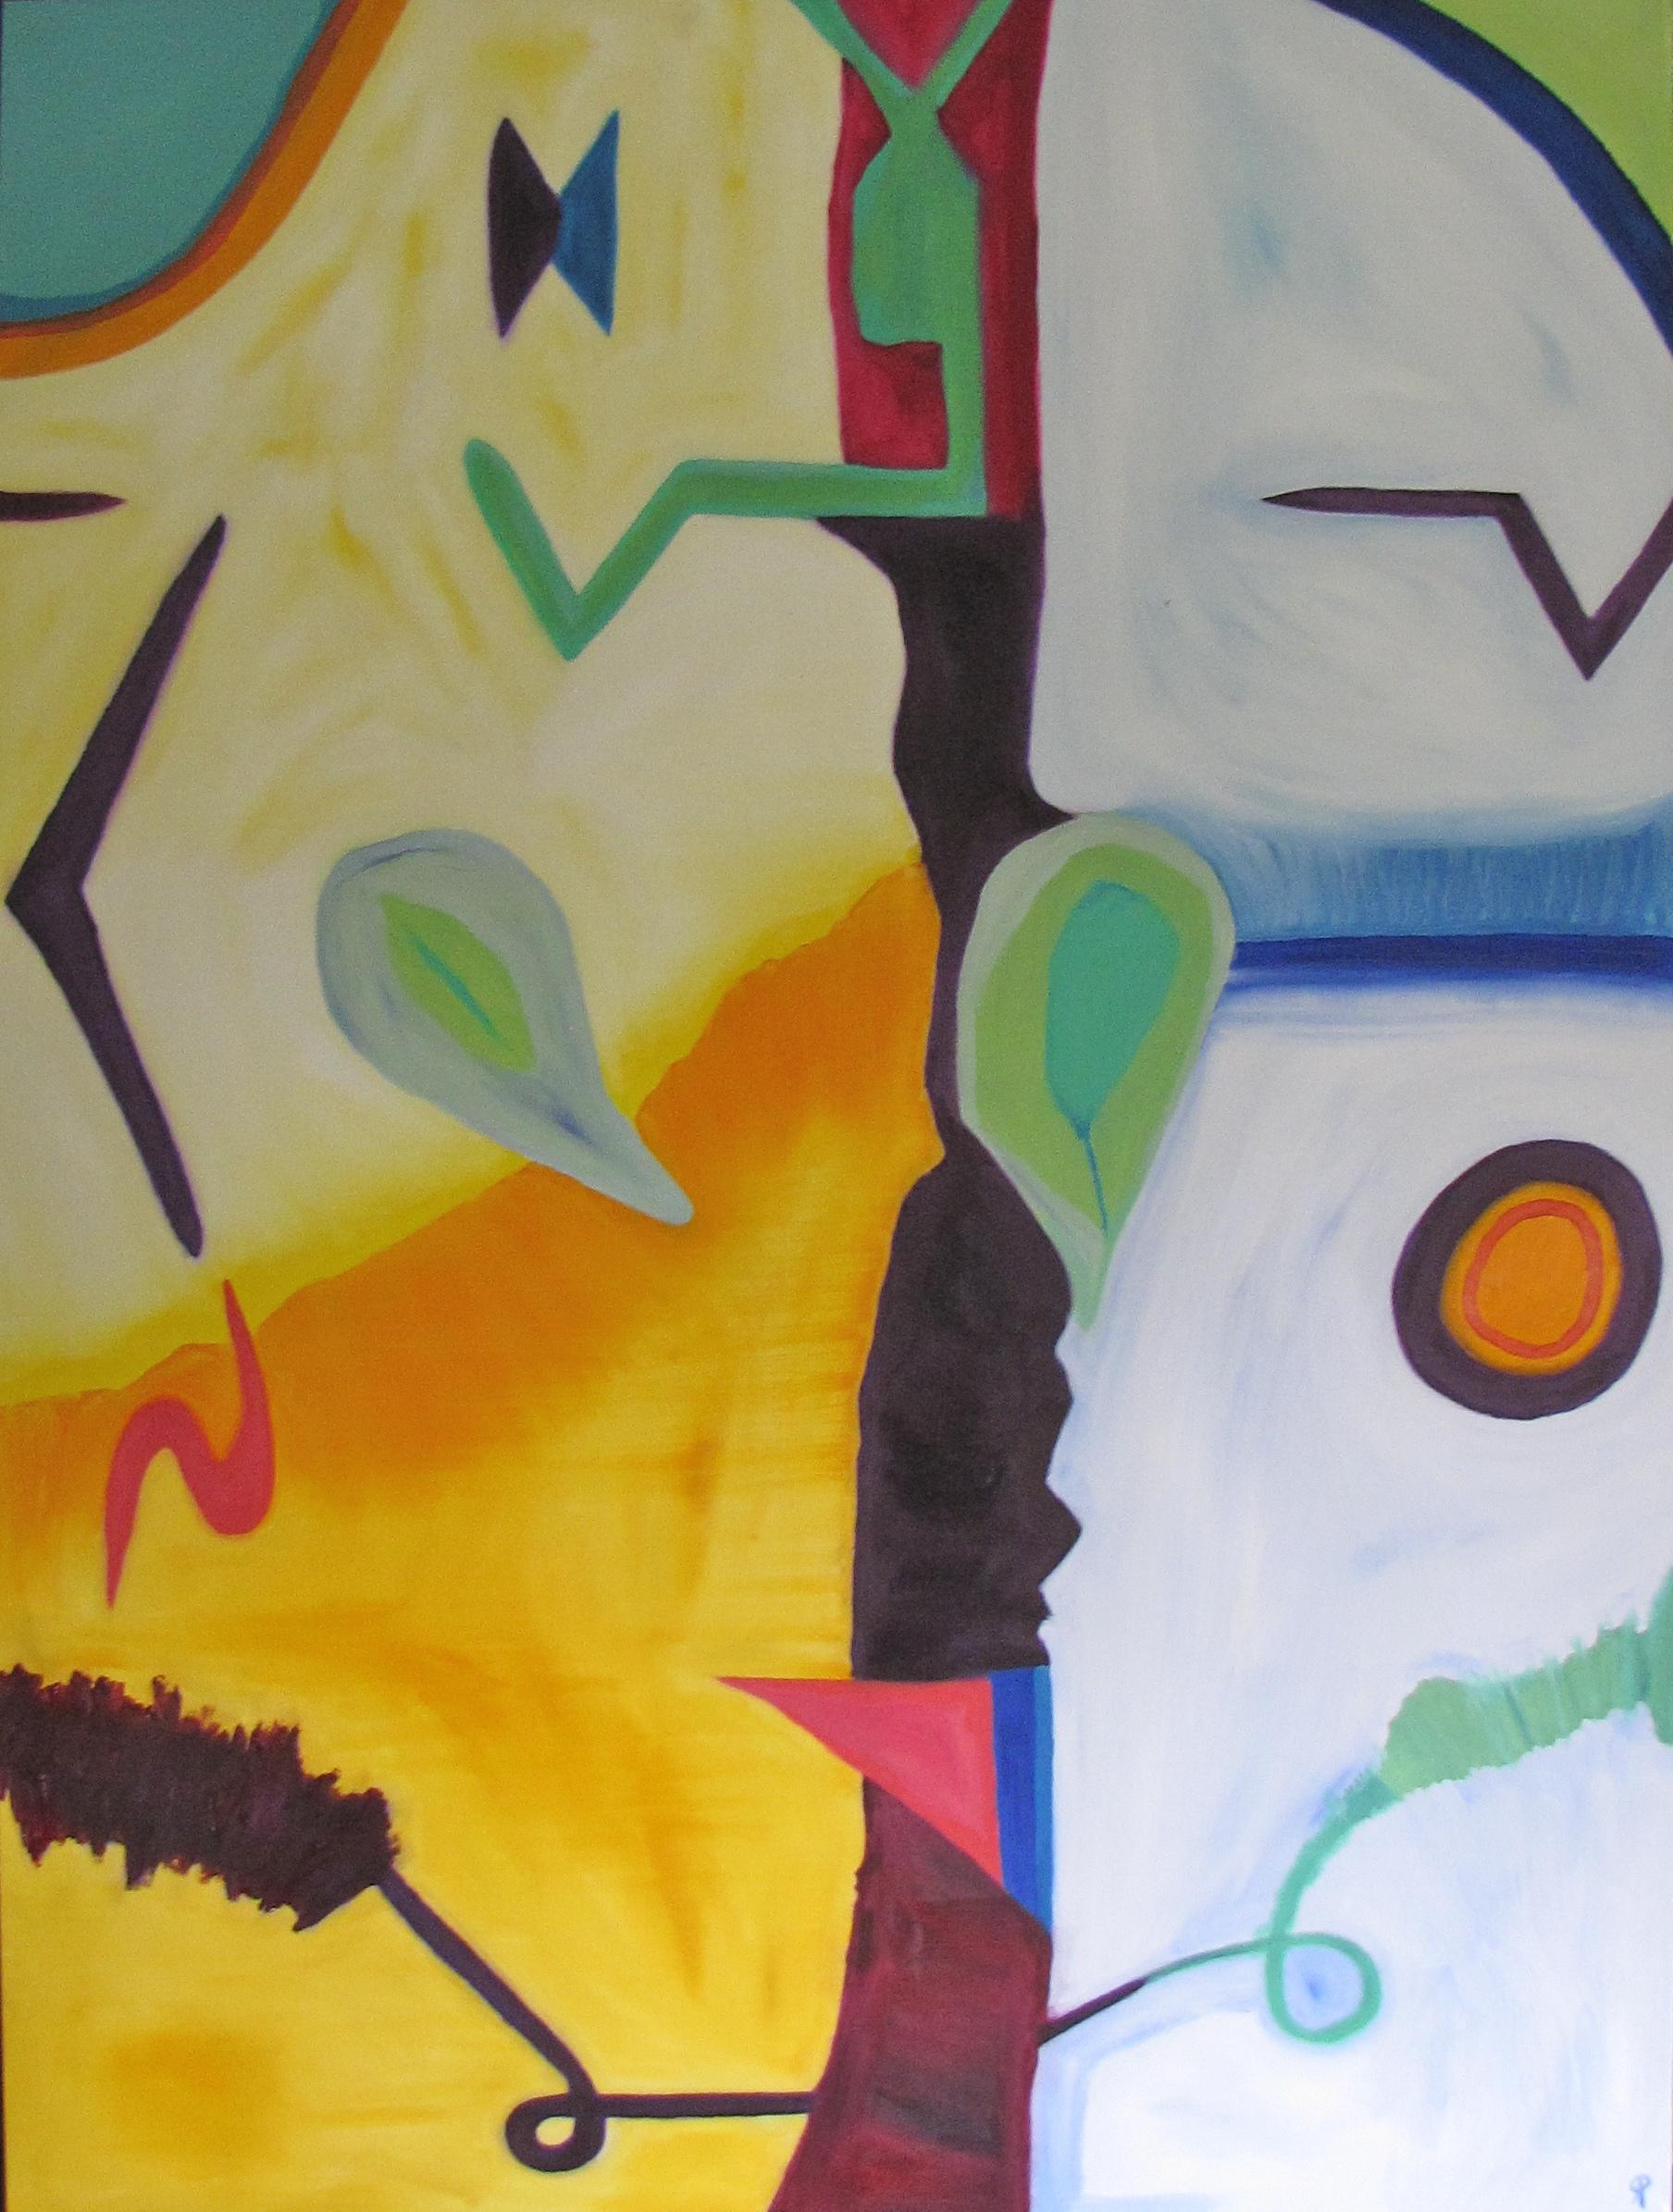 Quadrangle, Russell Steven Powell oil on canvas, 36x48